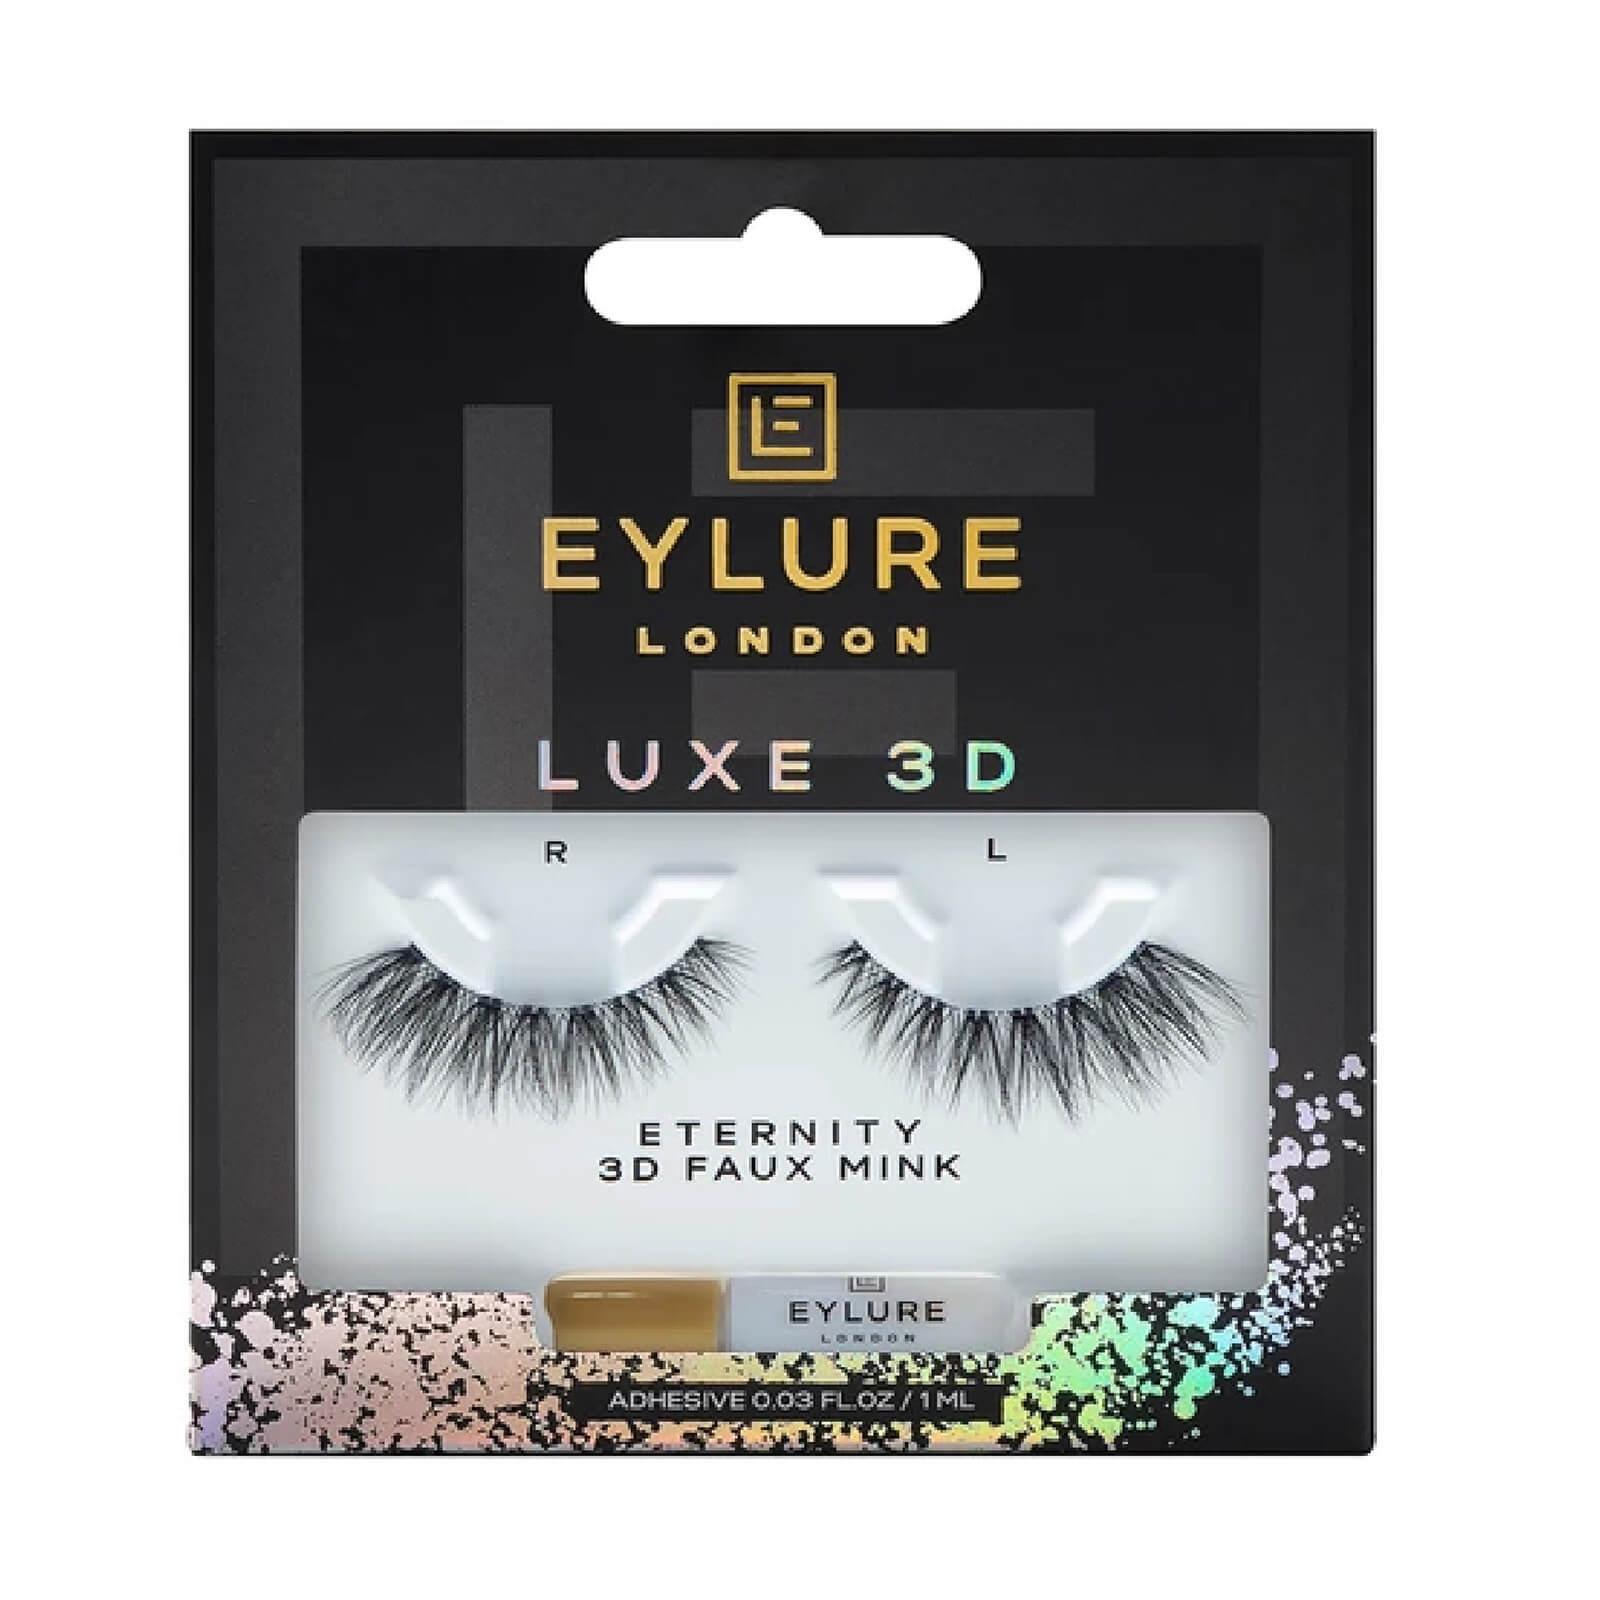 Купить Eylure Luxe 3D Eternity Lash